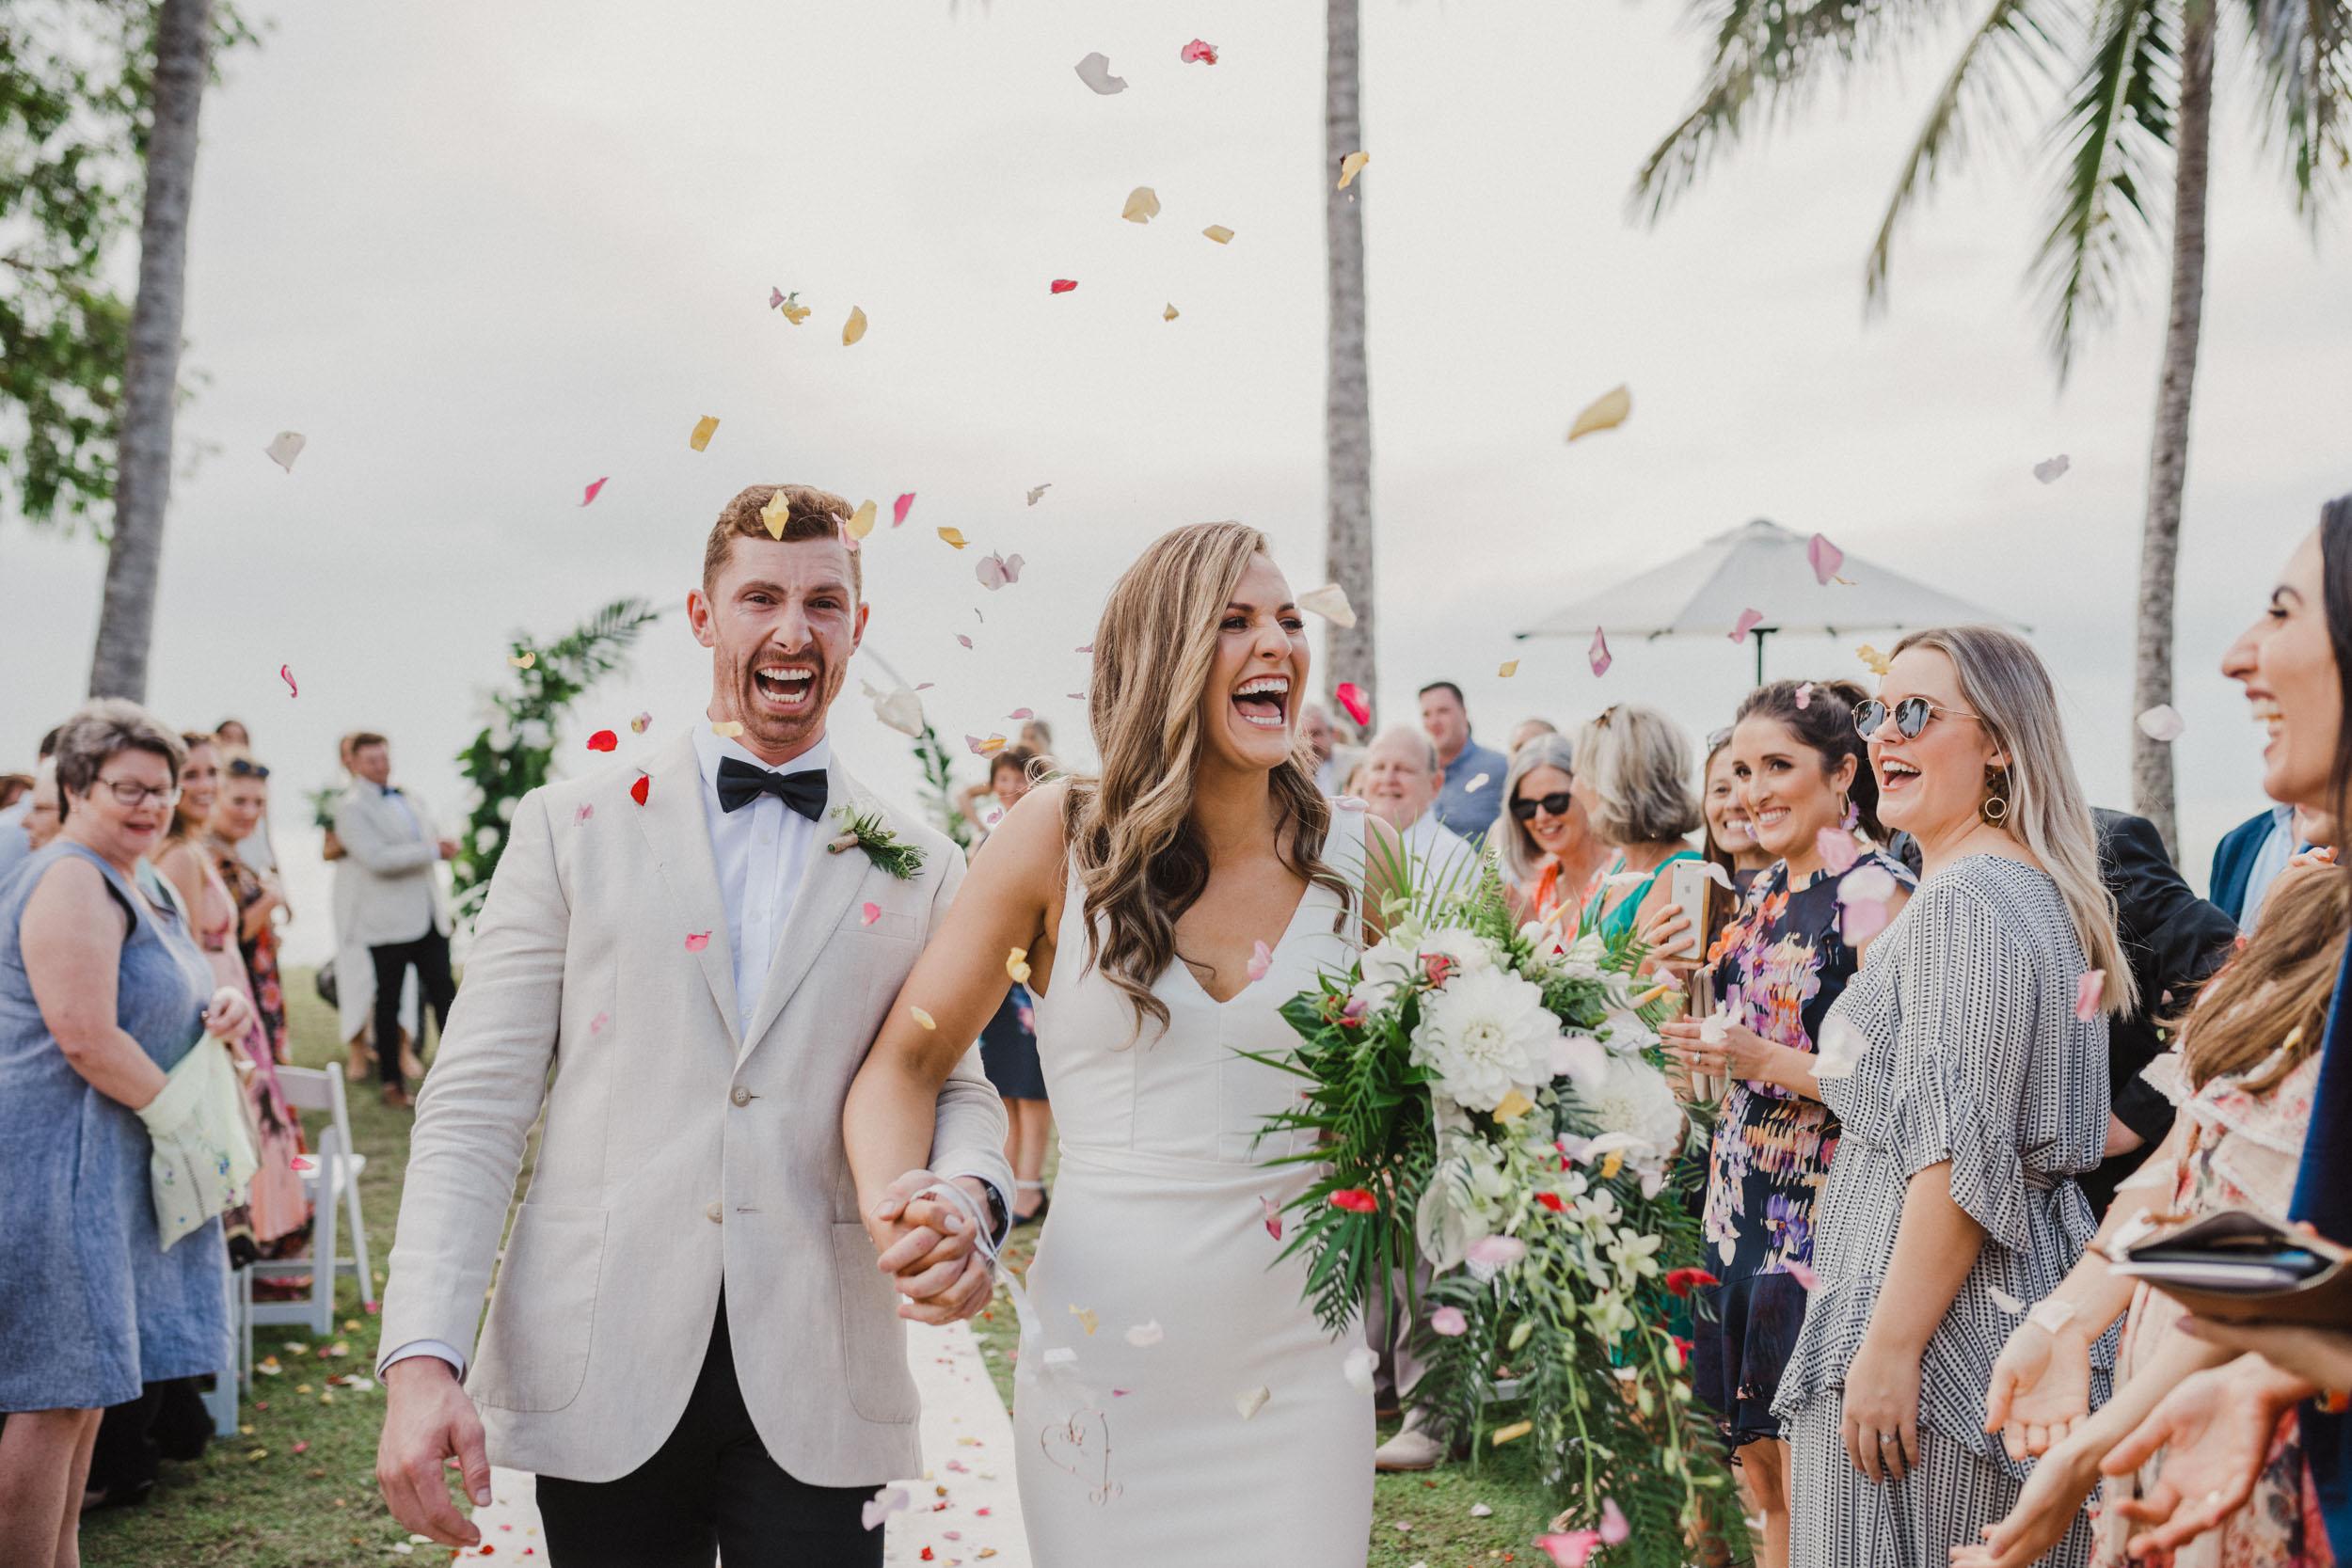 The Raw Photographer - Cairns Wedding Photographer - Port Douglas - Sugar Wharf - Vasaliki Couture Dress - Destination Venue-37.jpg